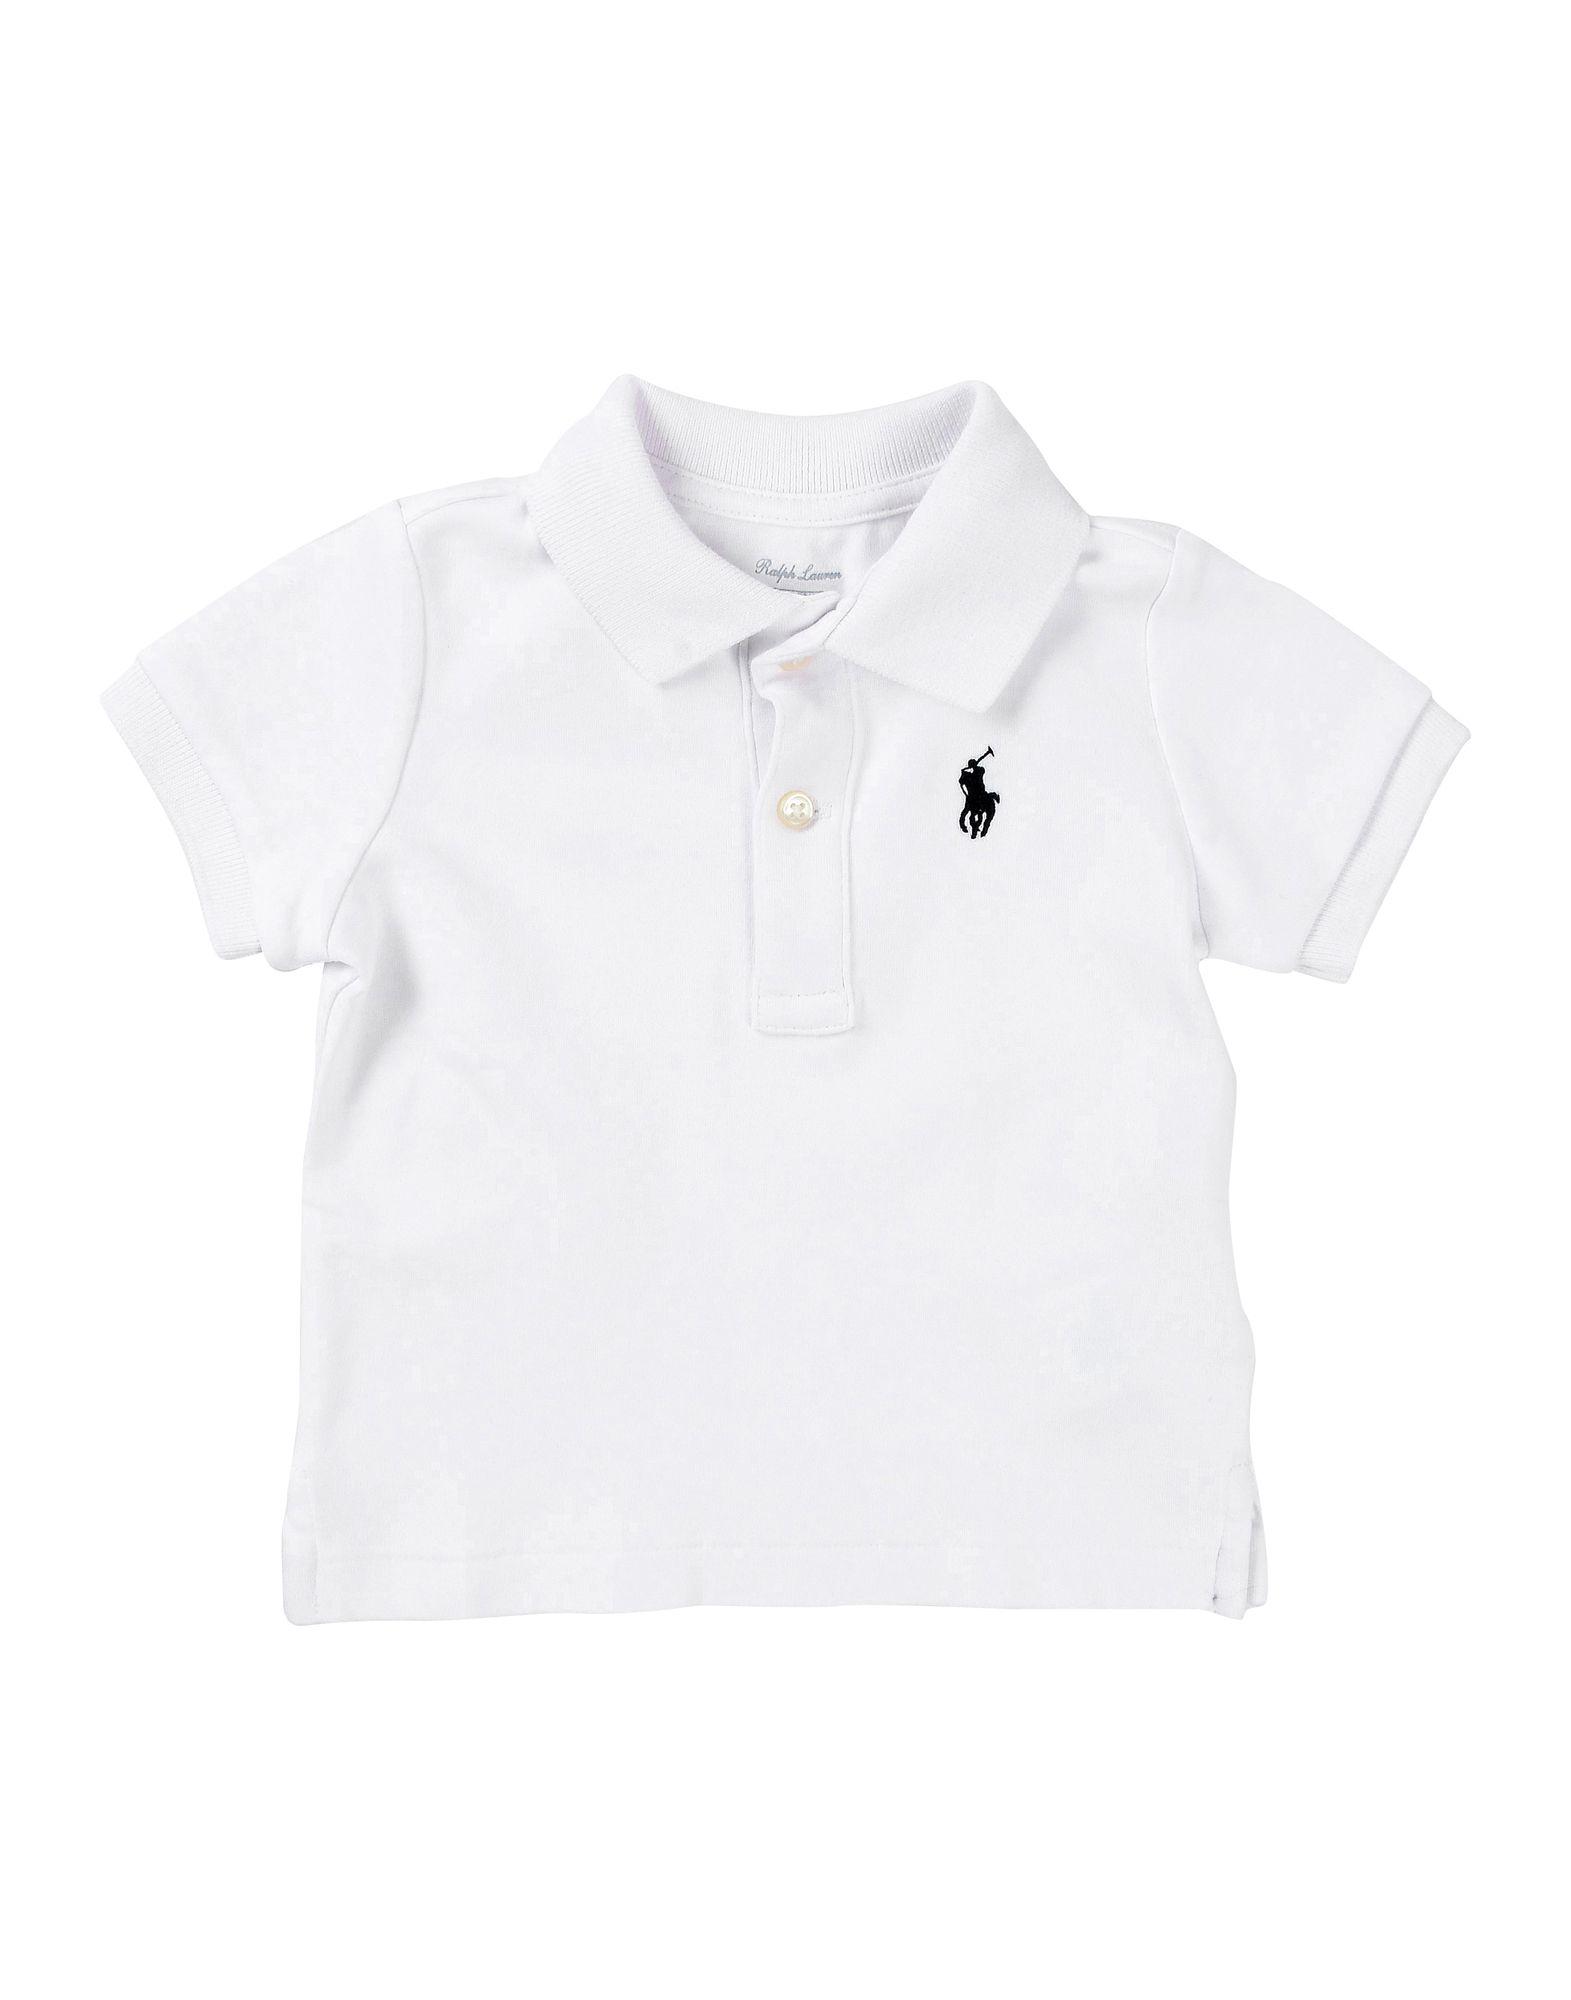 2610268a8d5 Μπλουζάκια Polo Αγόρι Ralph Lauren 0-24 μηνών - Παιδικά ρούχα στο YOOX